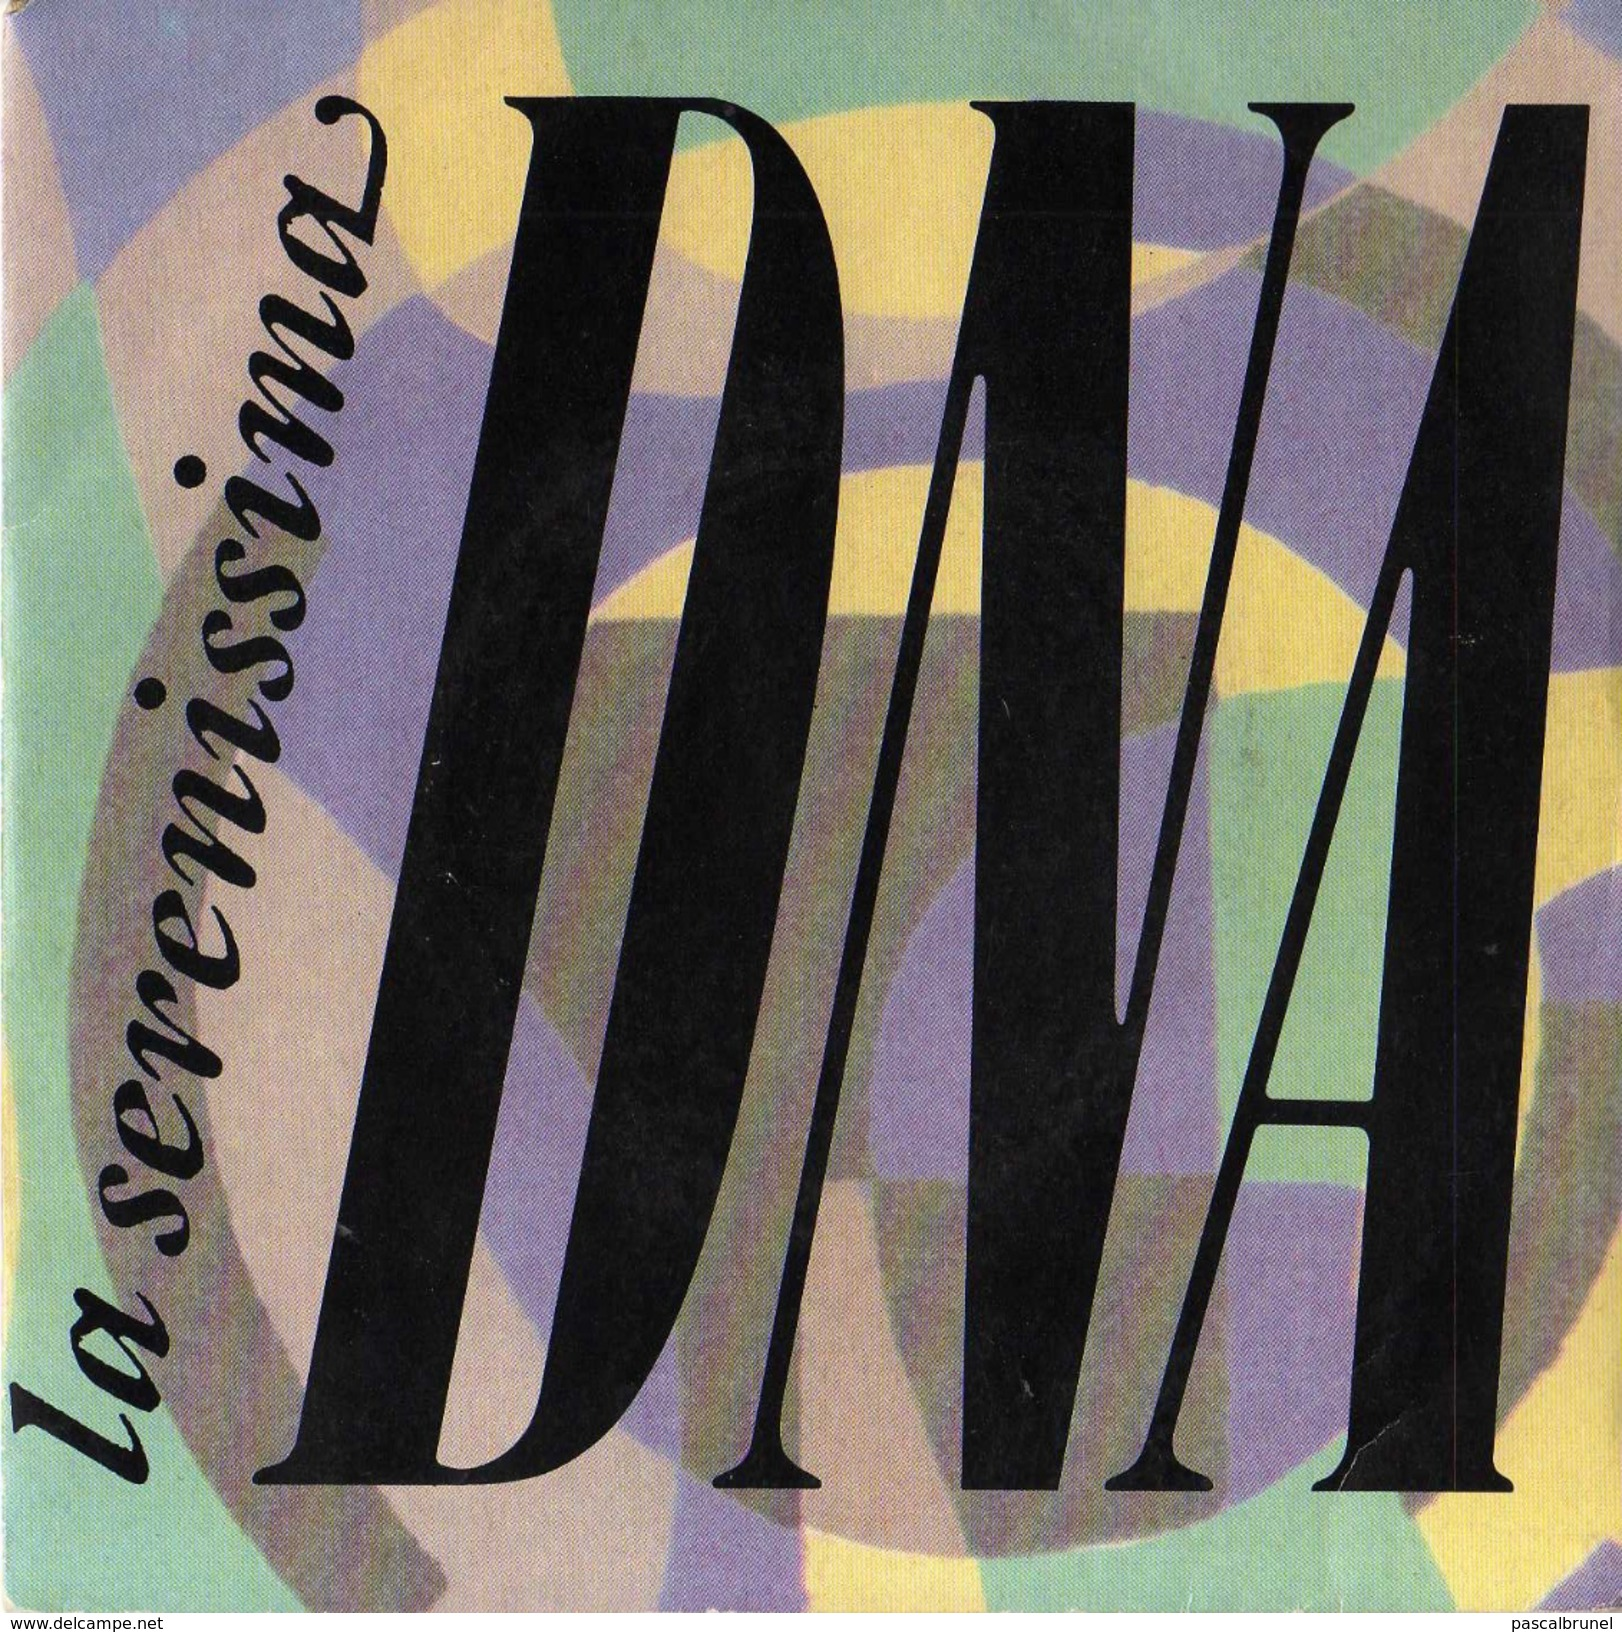 DNA - Disco, Pop